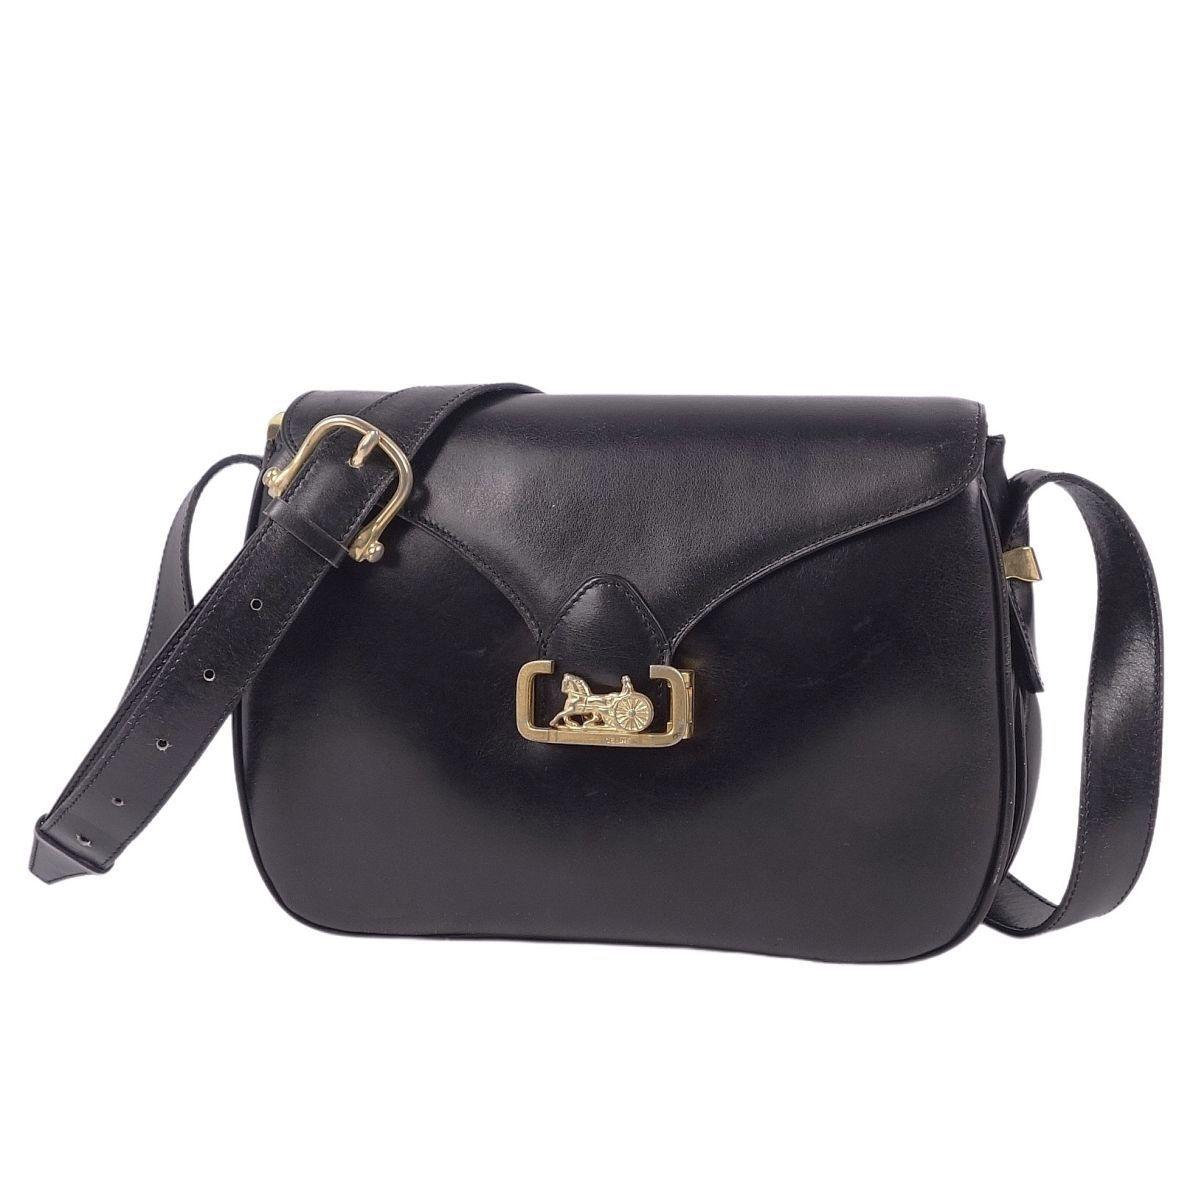 Celine CELINE carriage metal fittings smooth calf leather shoulder black / gold ladies